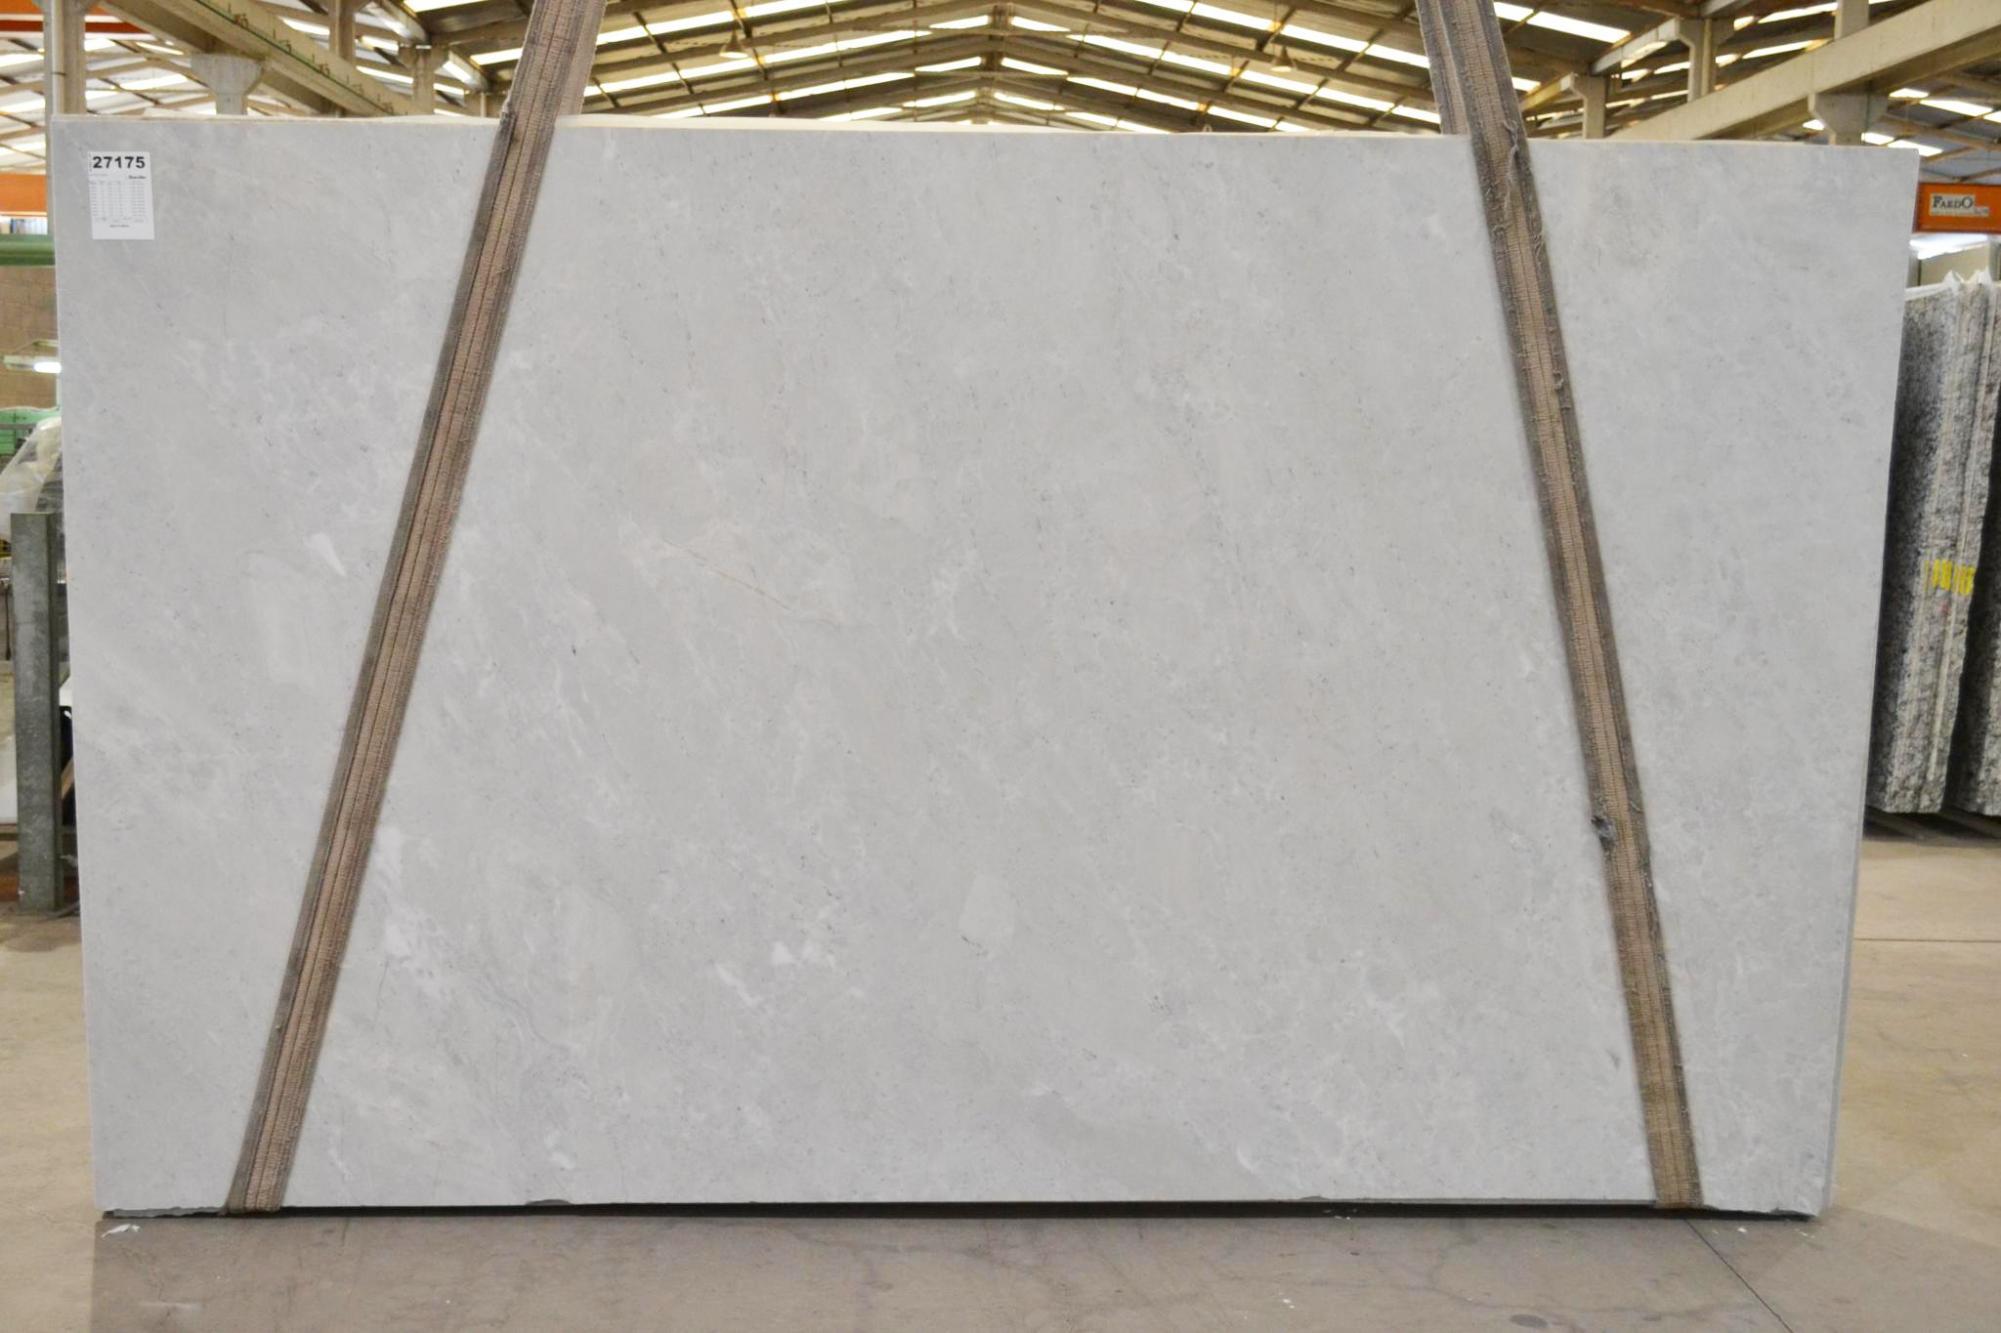 Brazilian Dolomite Supply Espirito Santo (Brazil) polished slabs 2465 , Bnd #27175 natural Dolomite